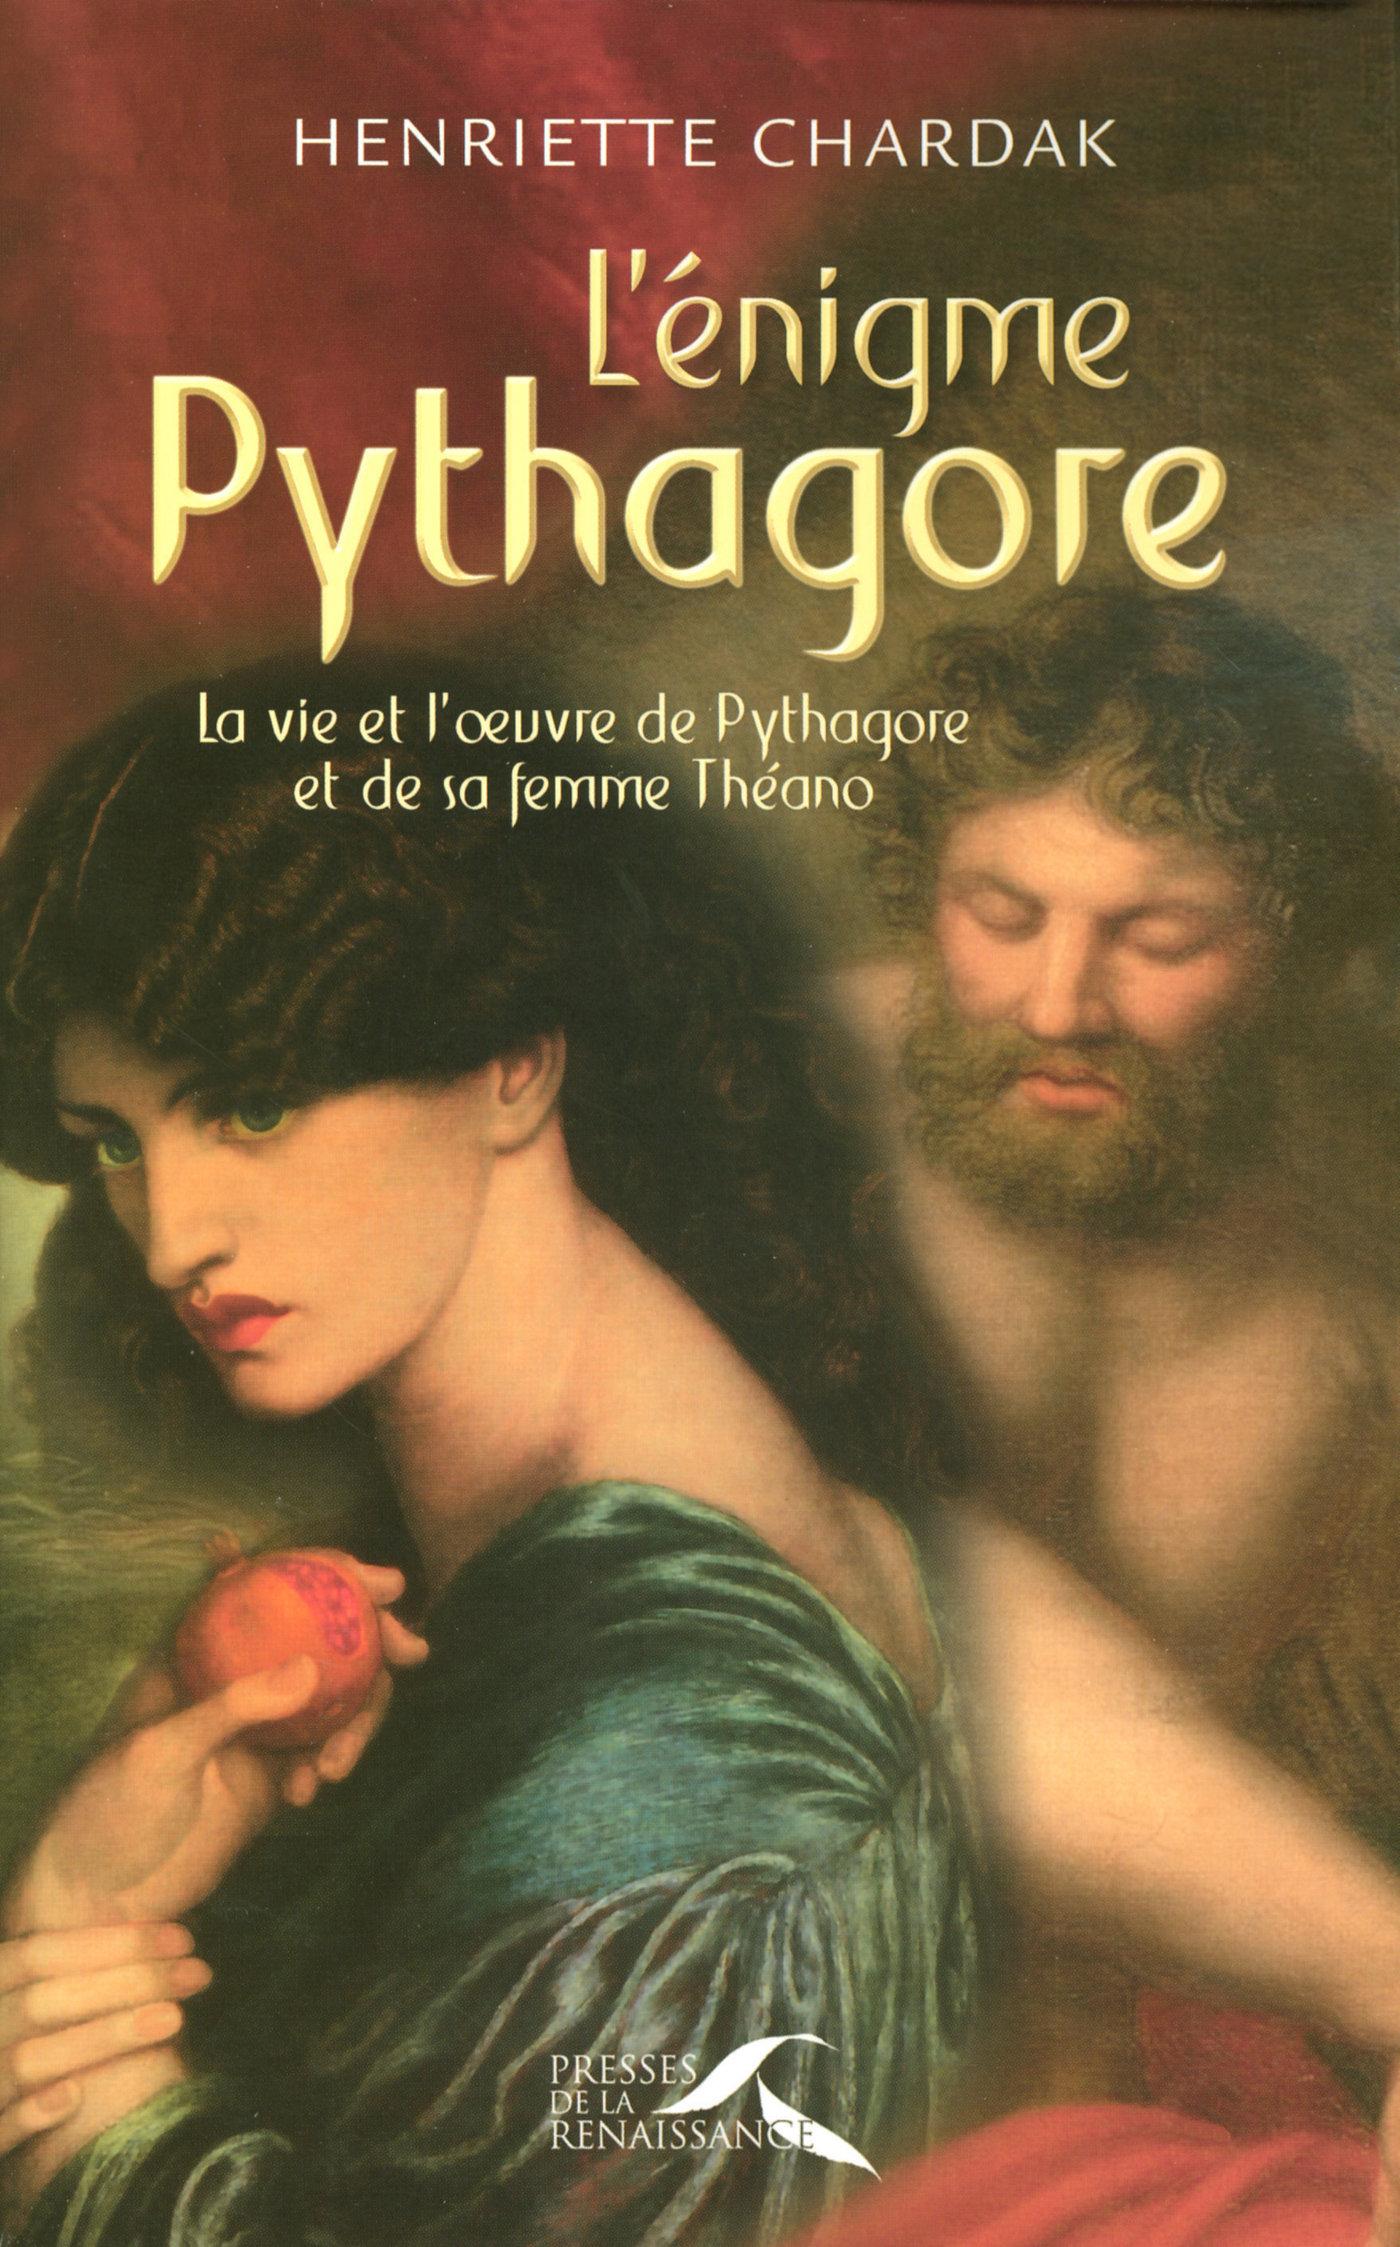 L'énigme Pythagore | CHARDAK, Henriette